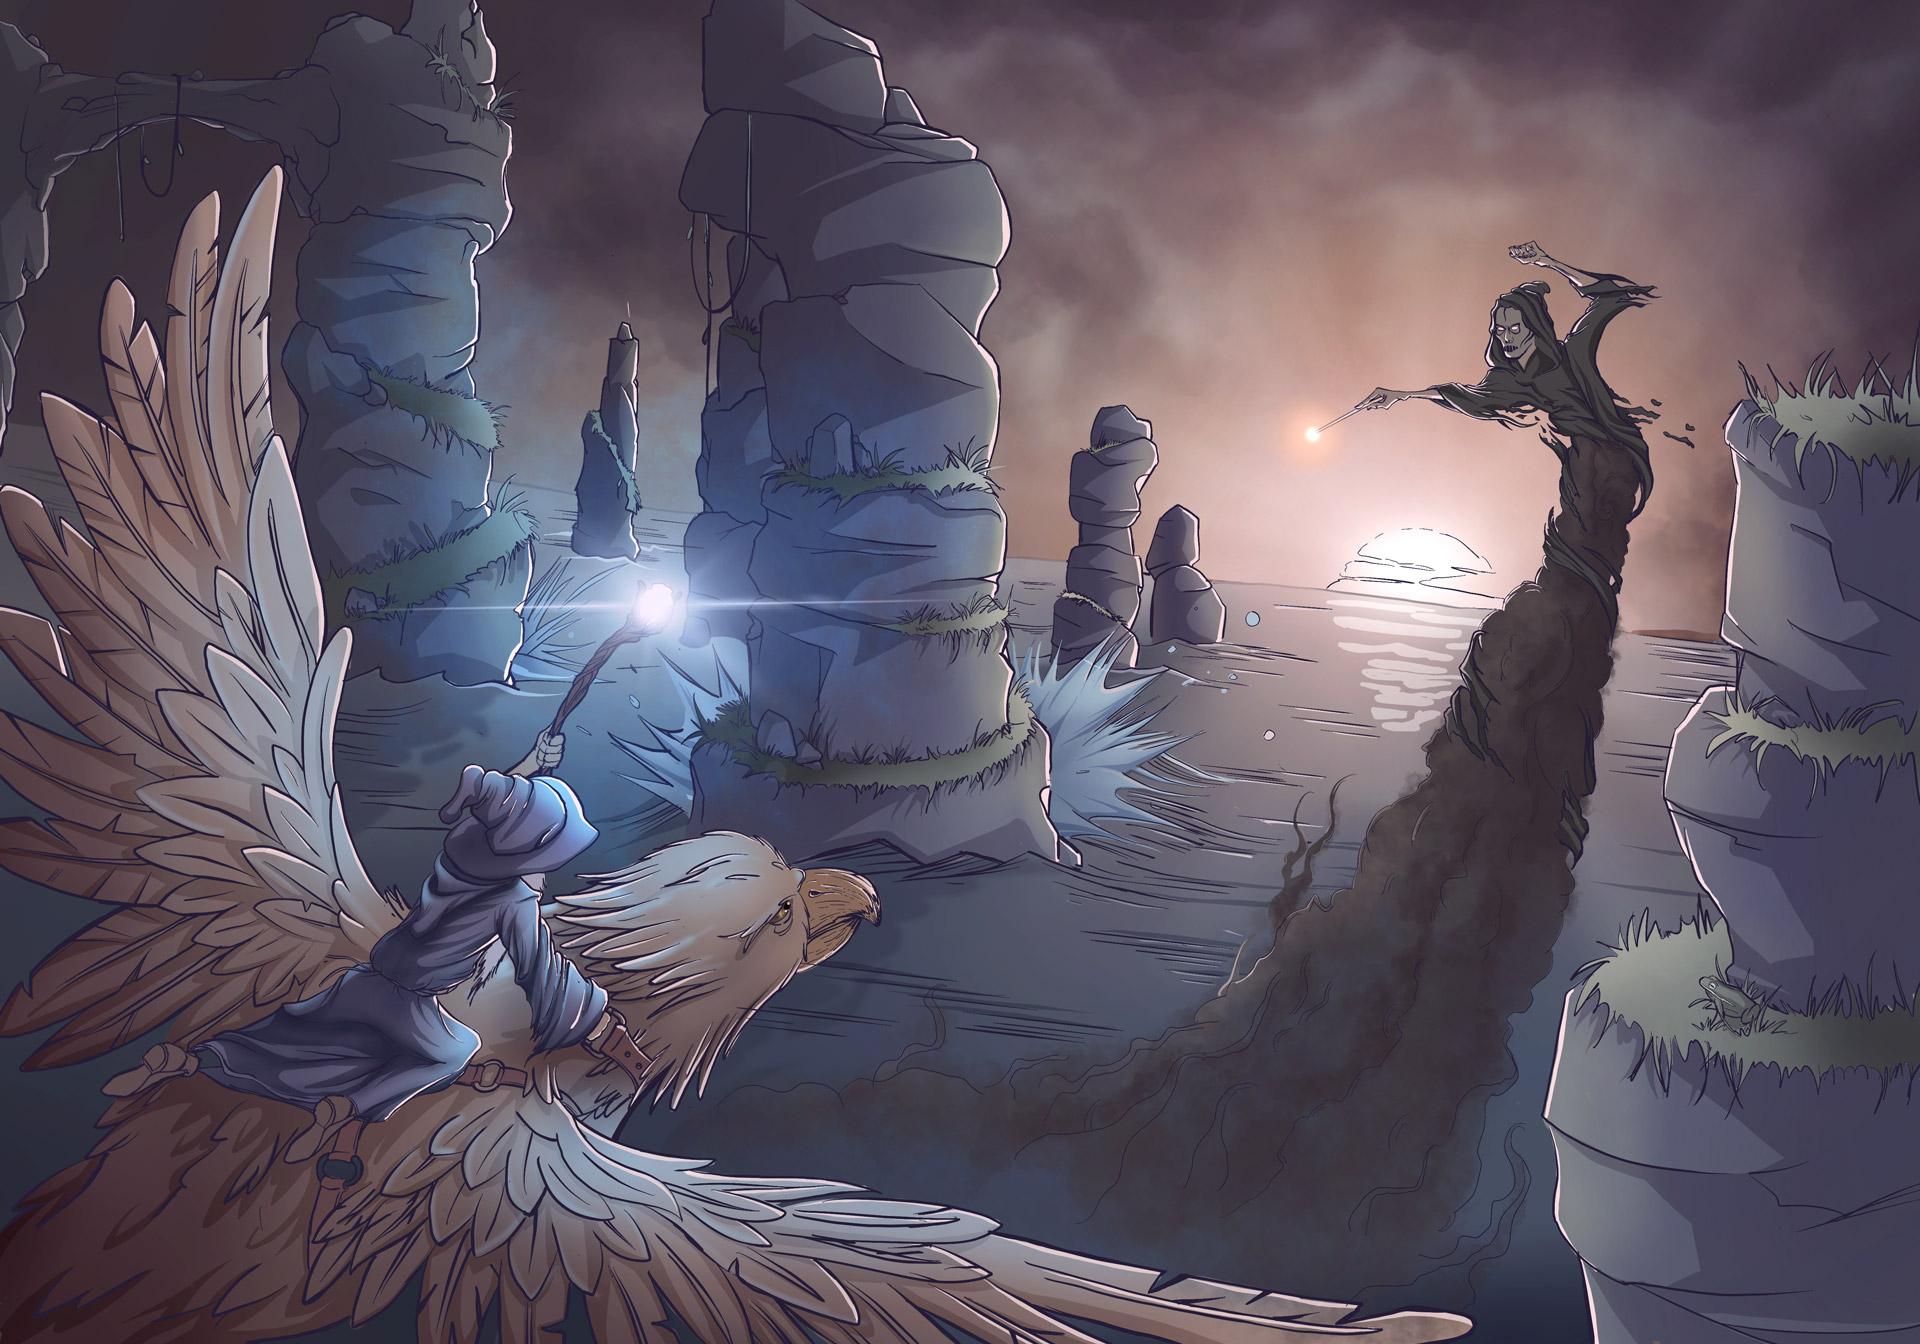 Gandalf vs deatheater